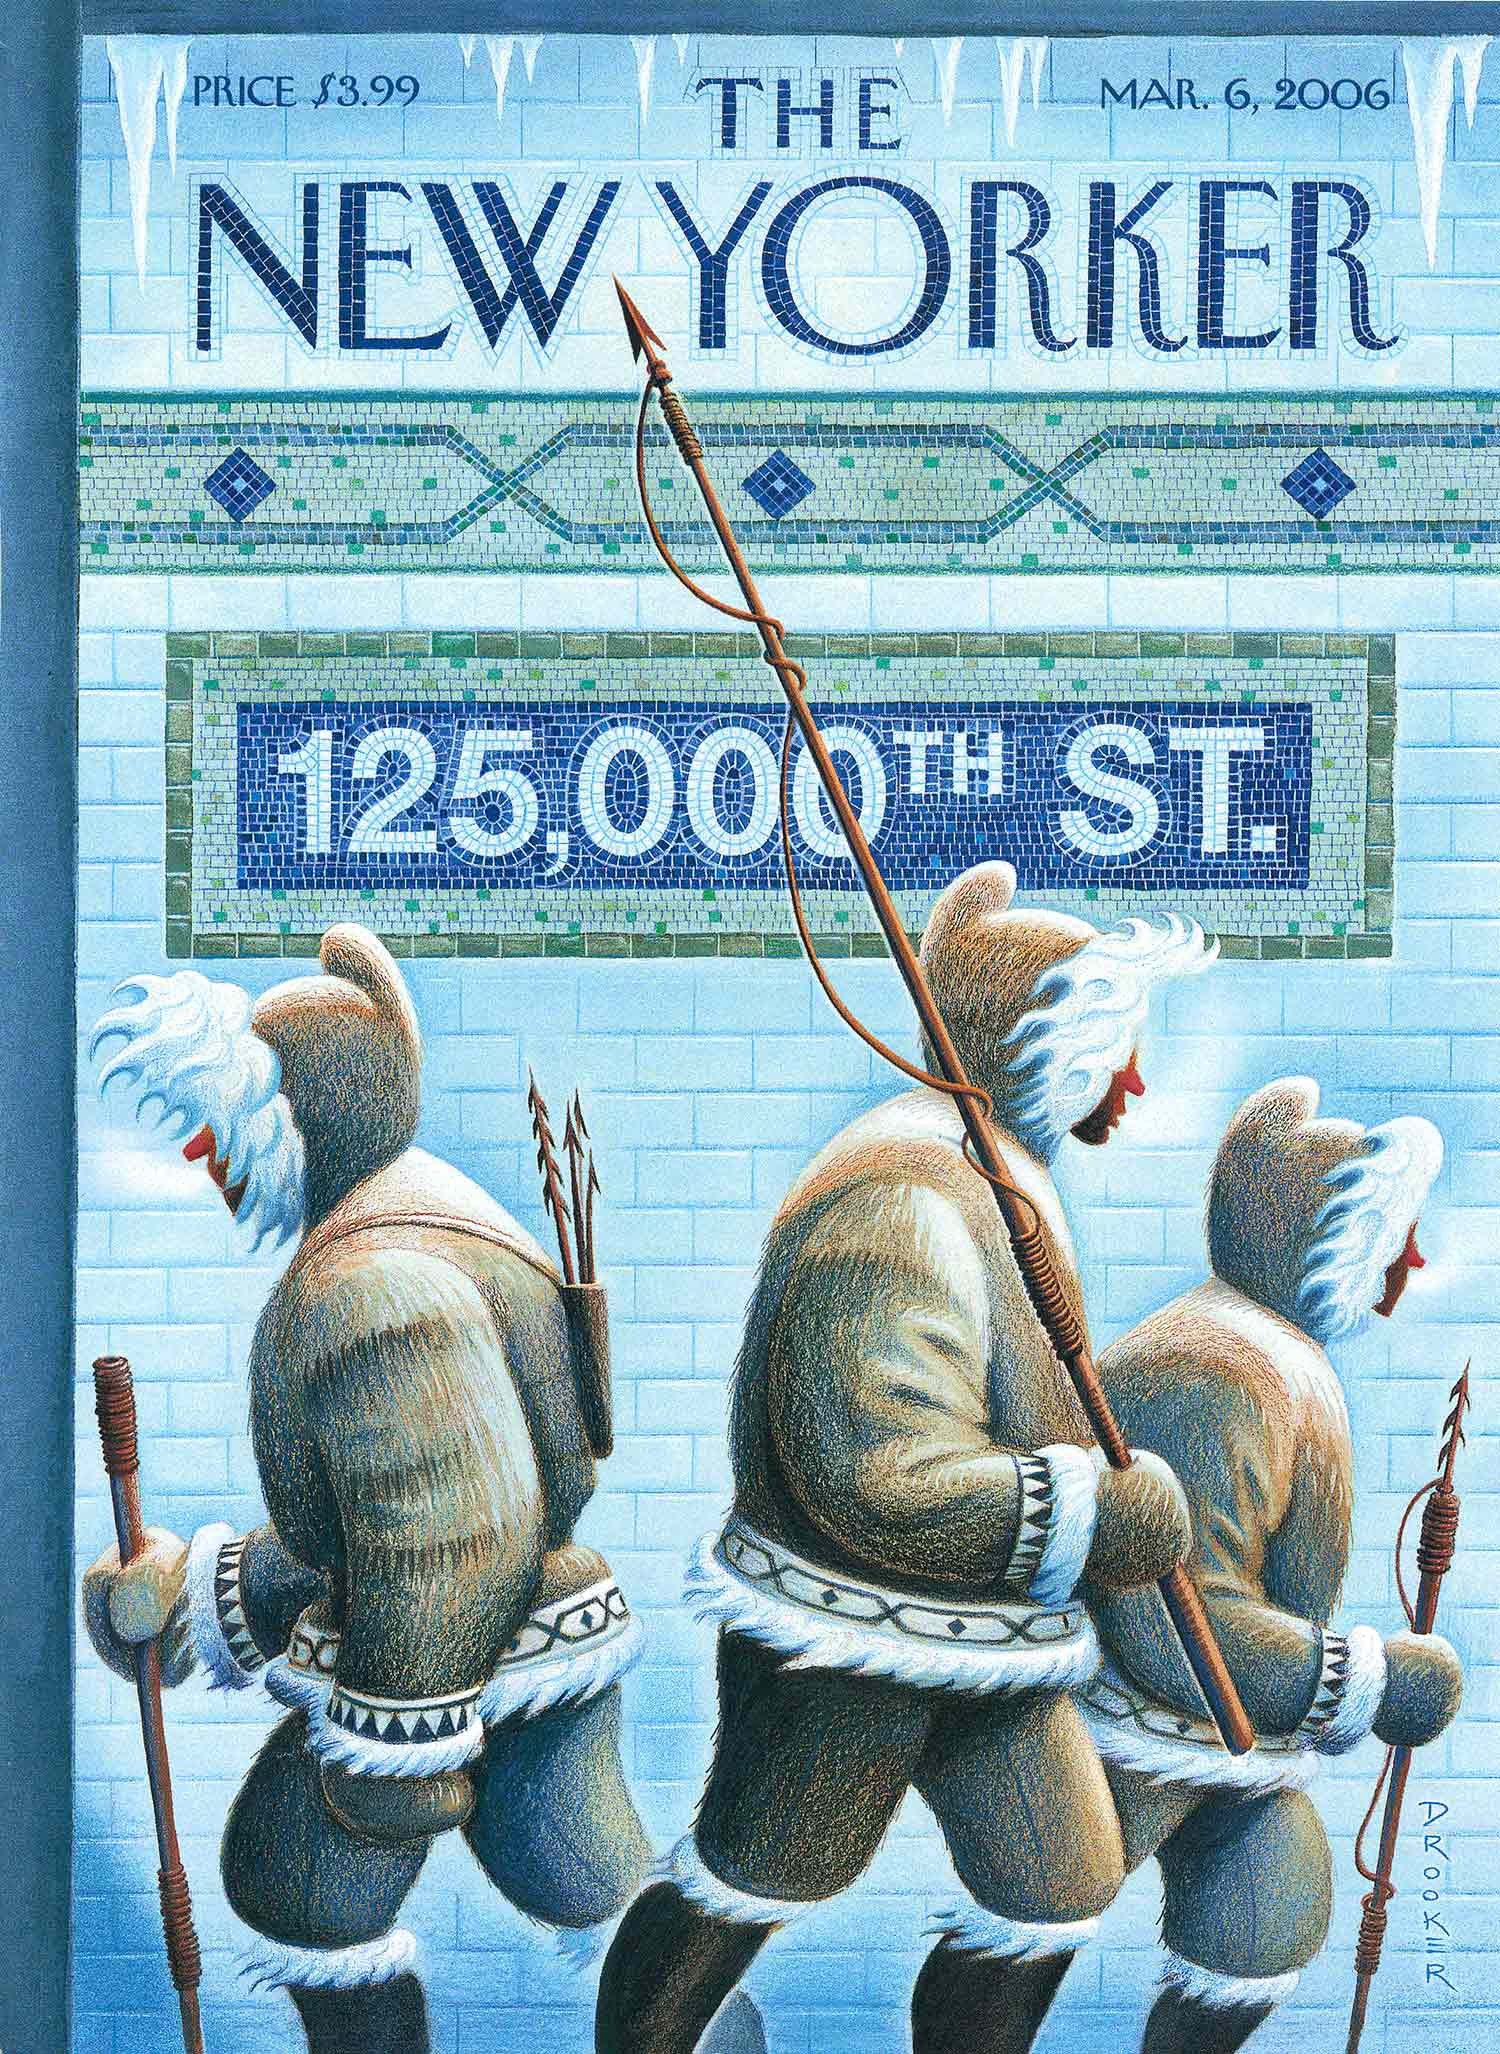 125,000th Street